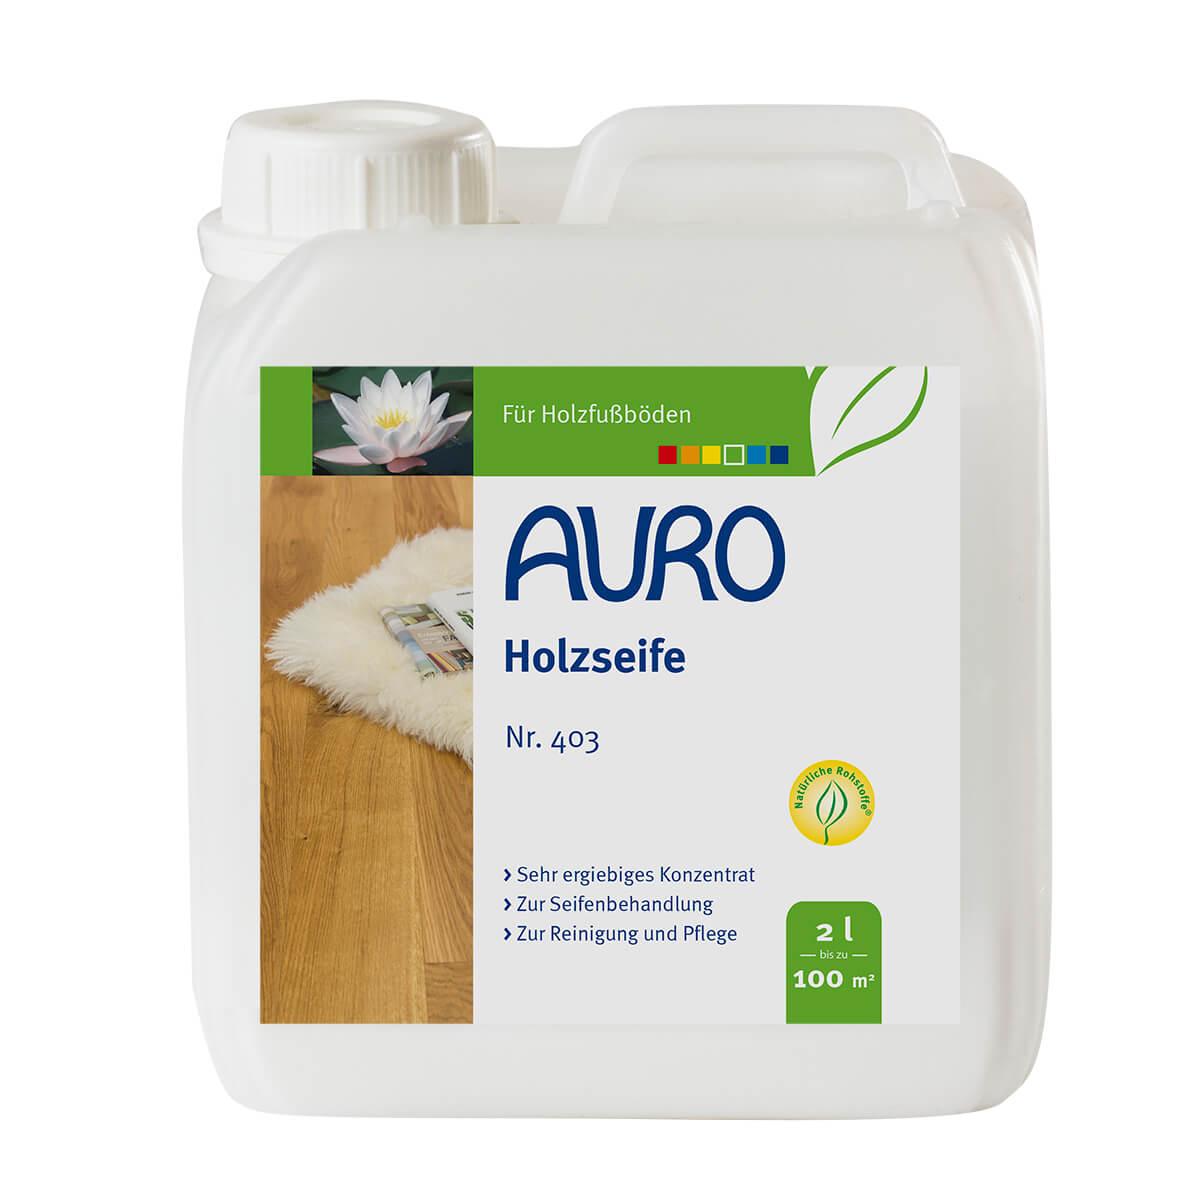 AURO Holzseife Nr. 403 - 2 L